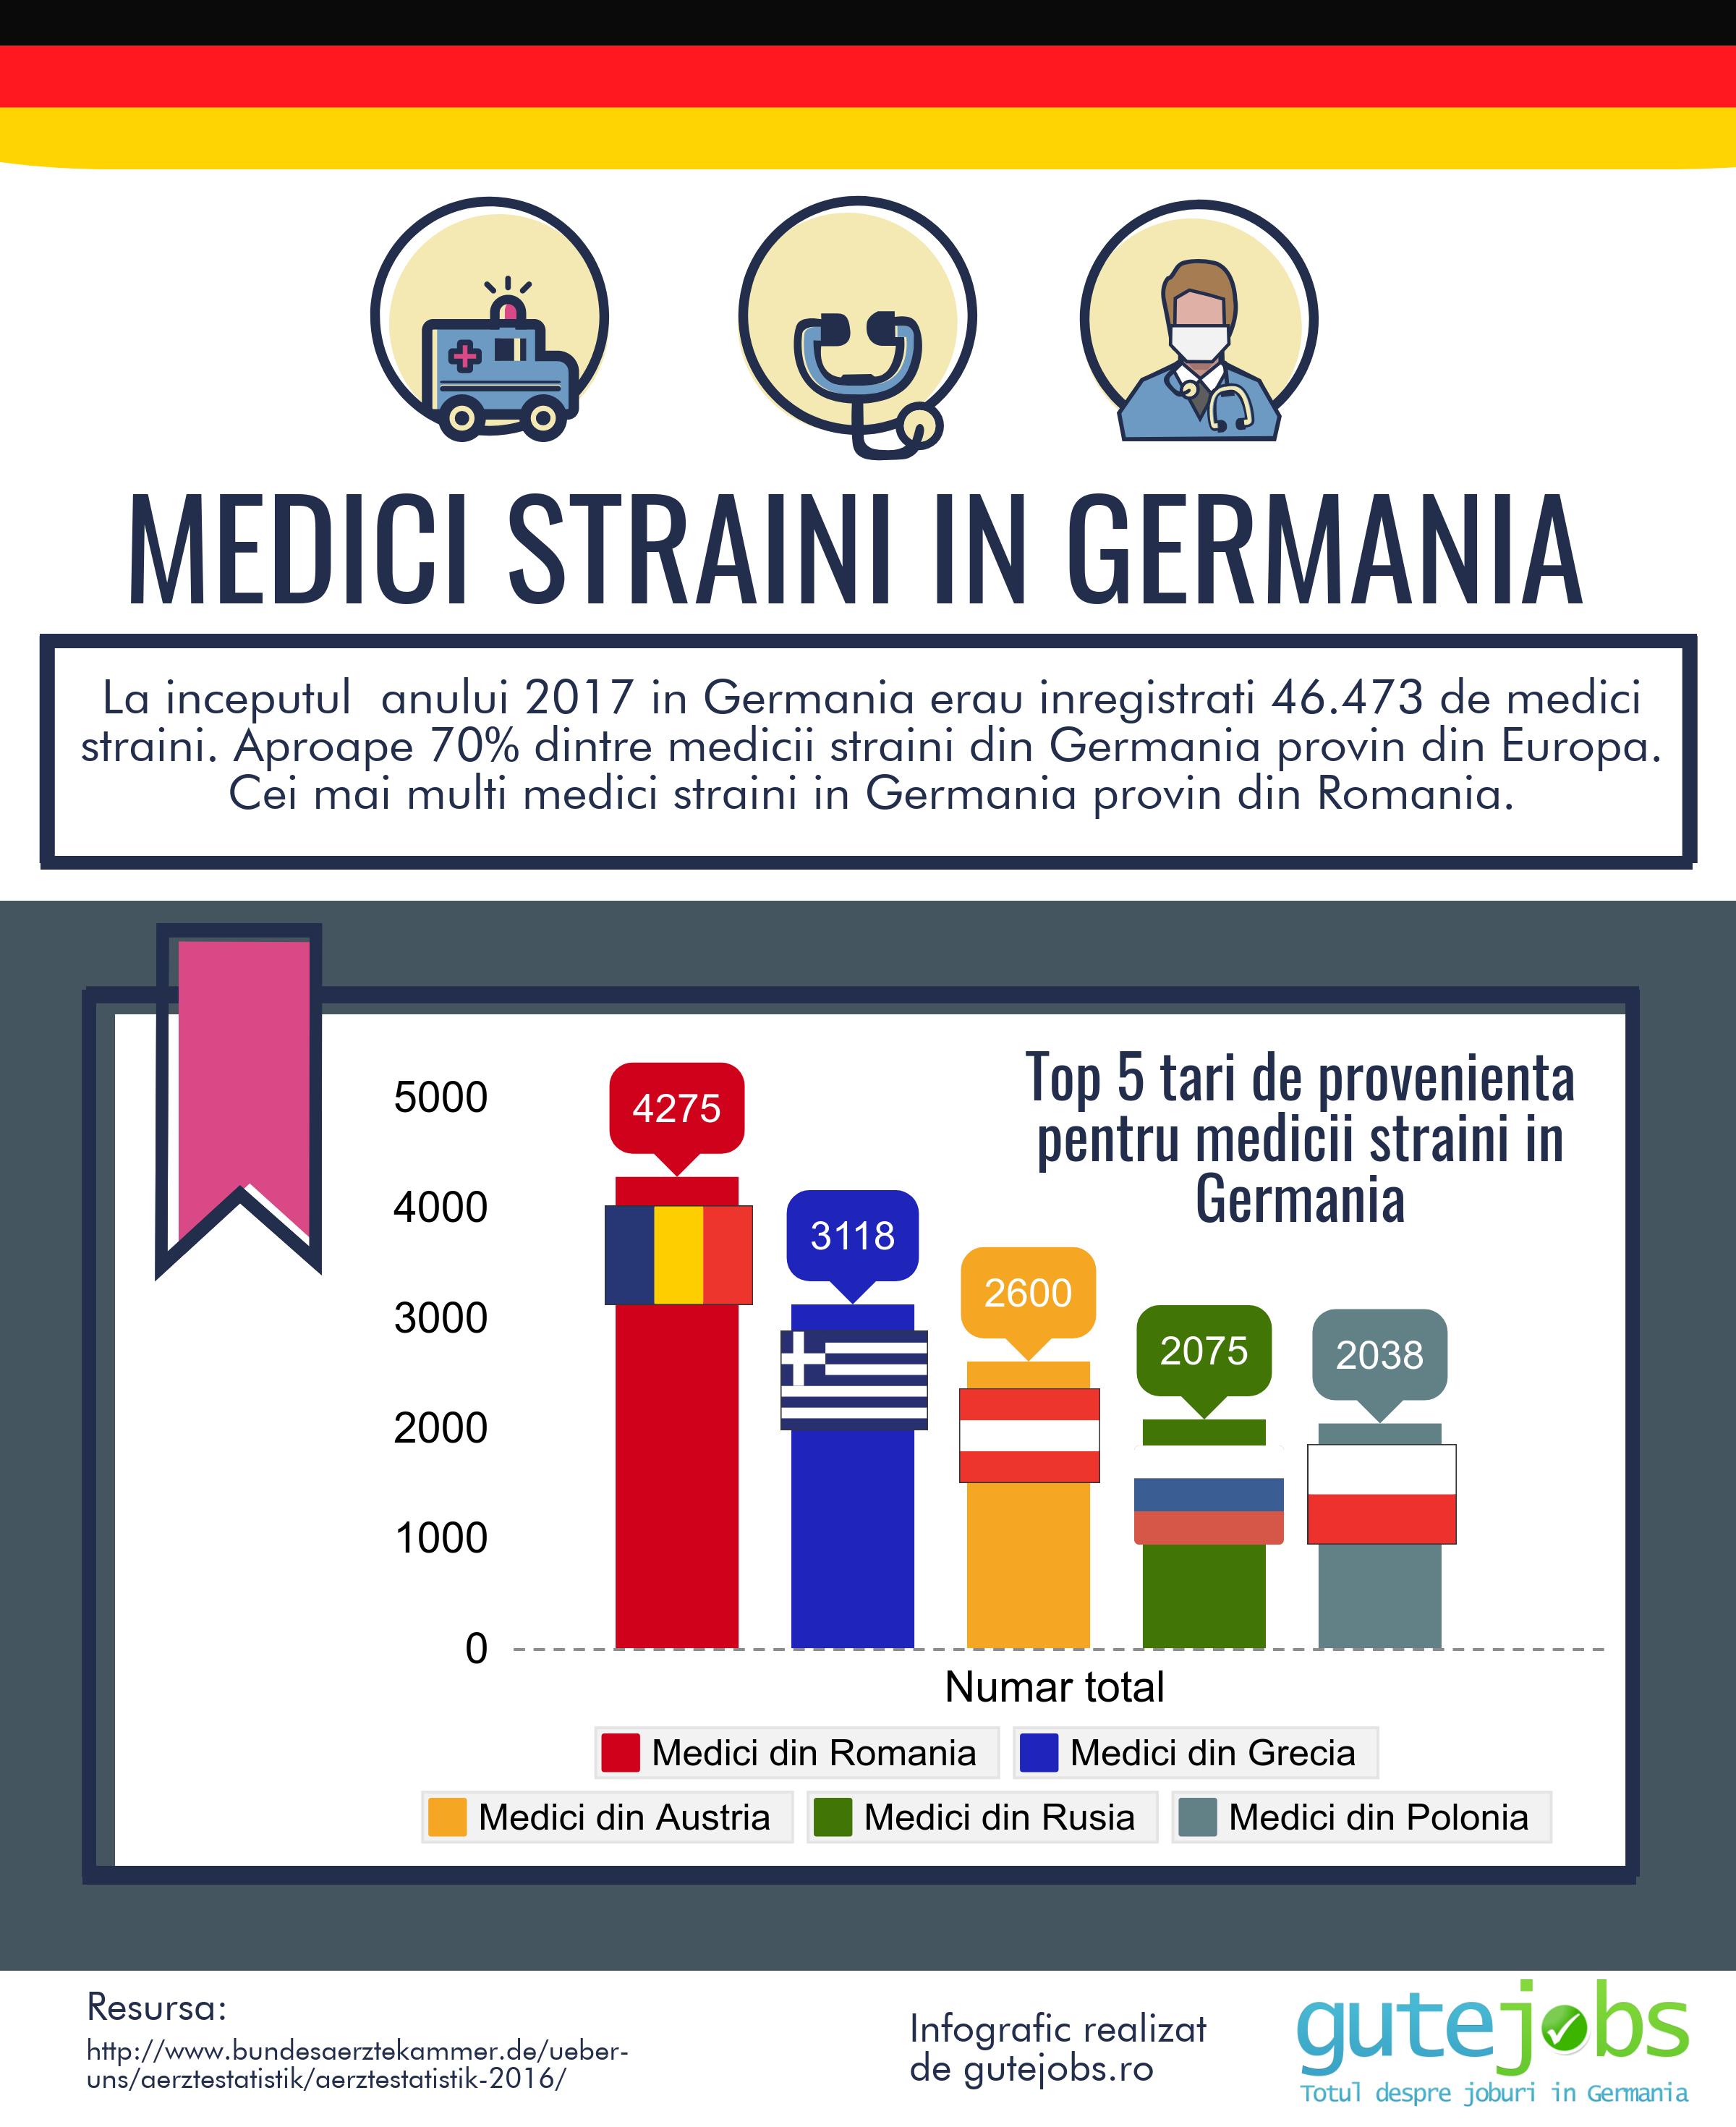 medici romani in germania